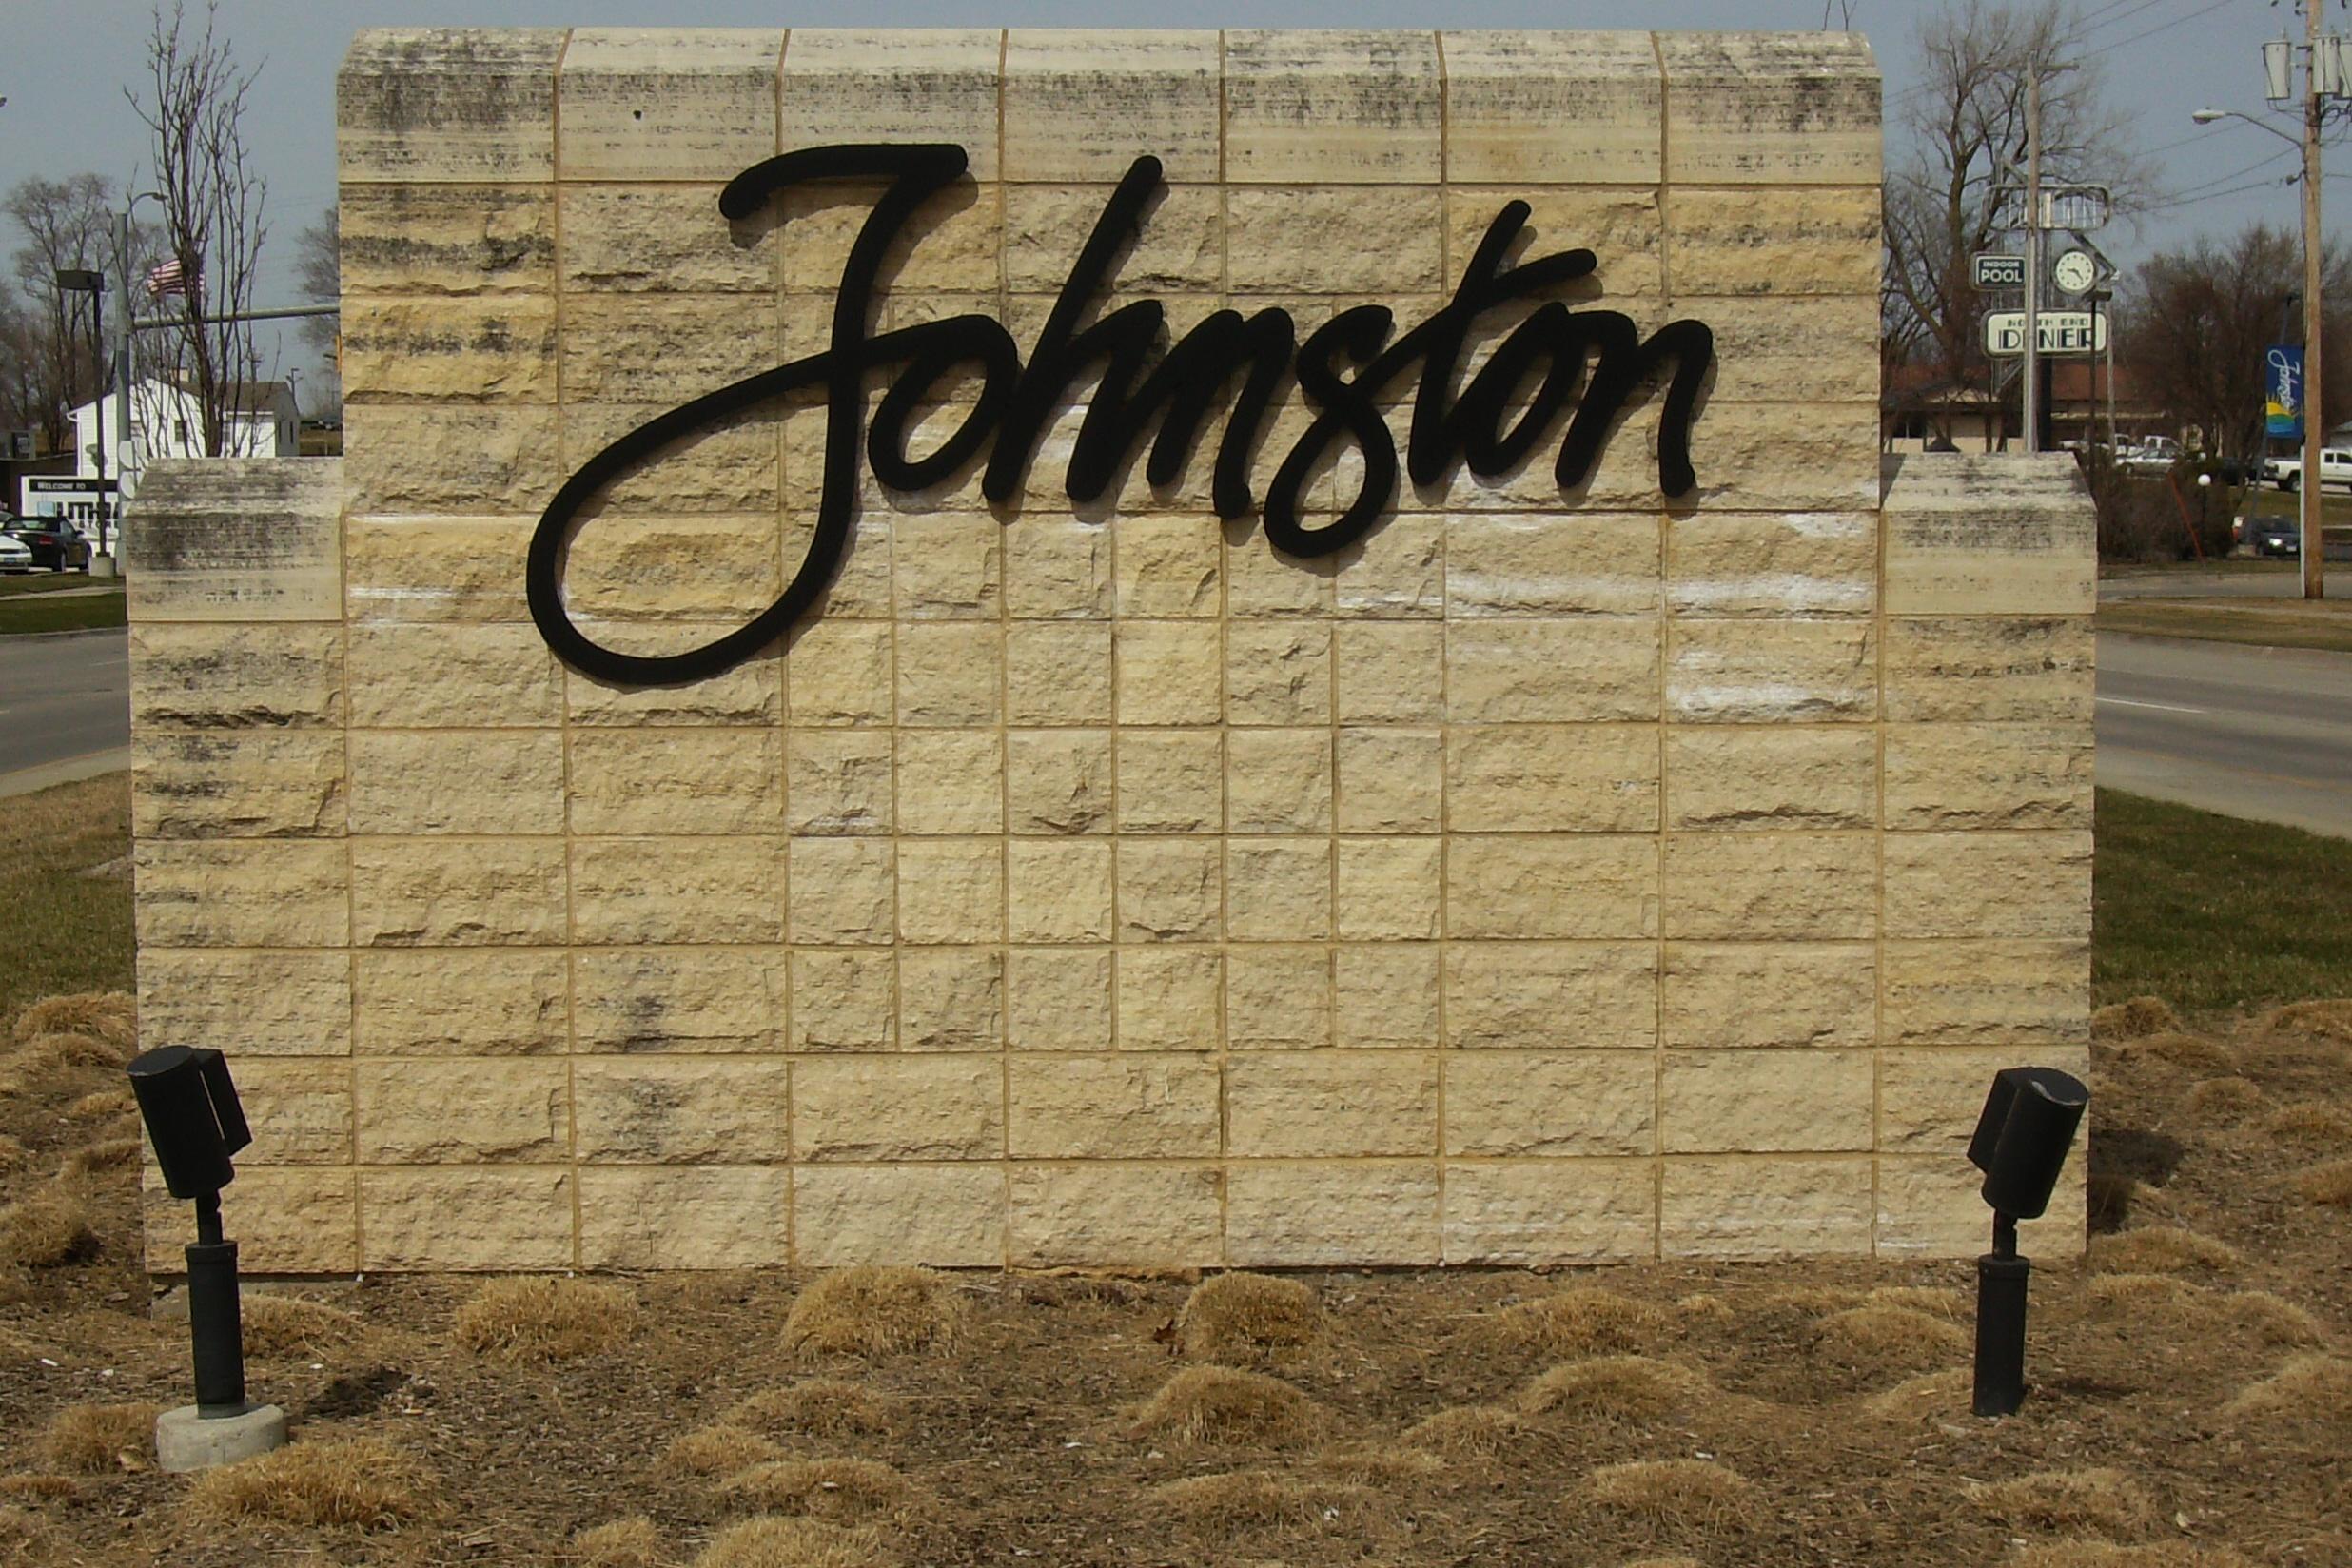 Johnston Iowa welcome_sign.jpg